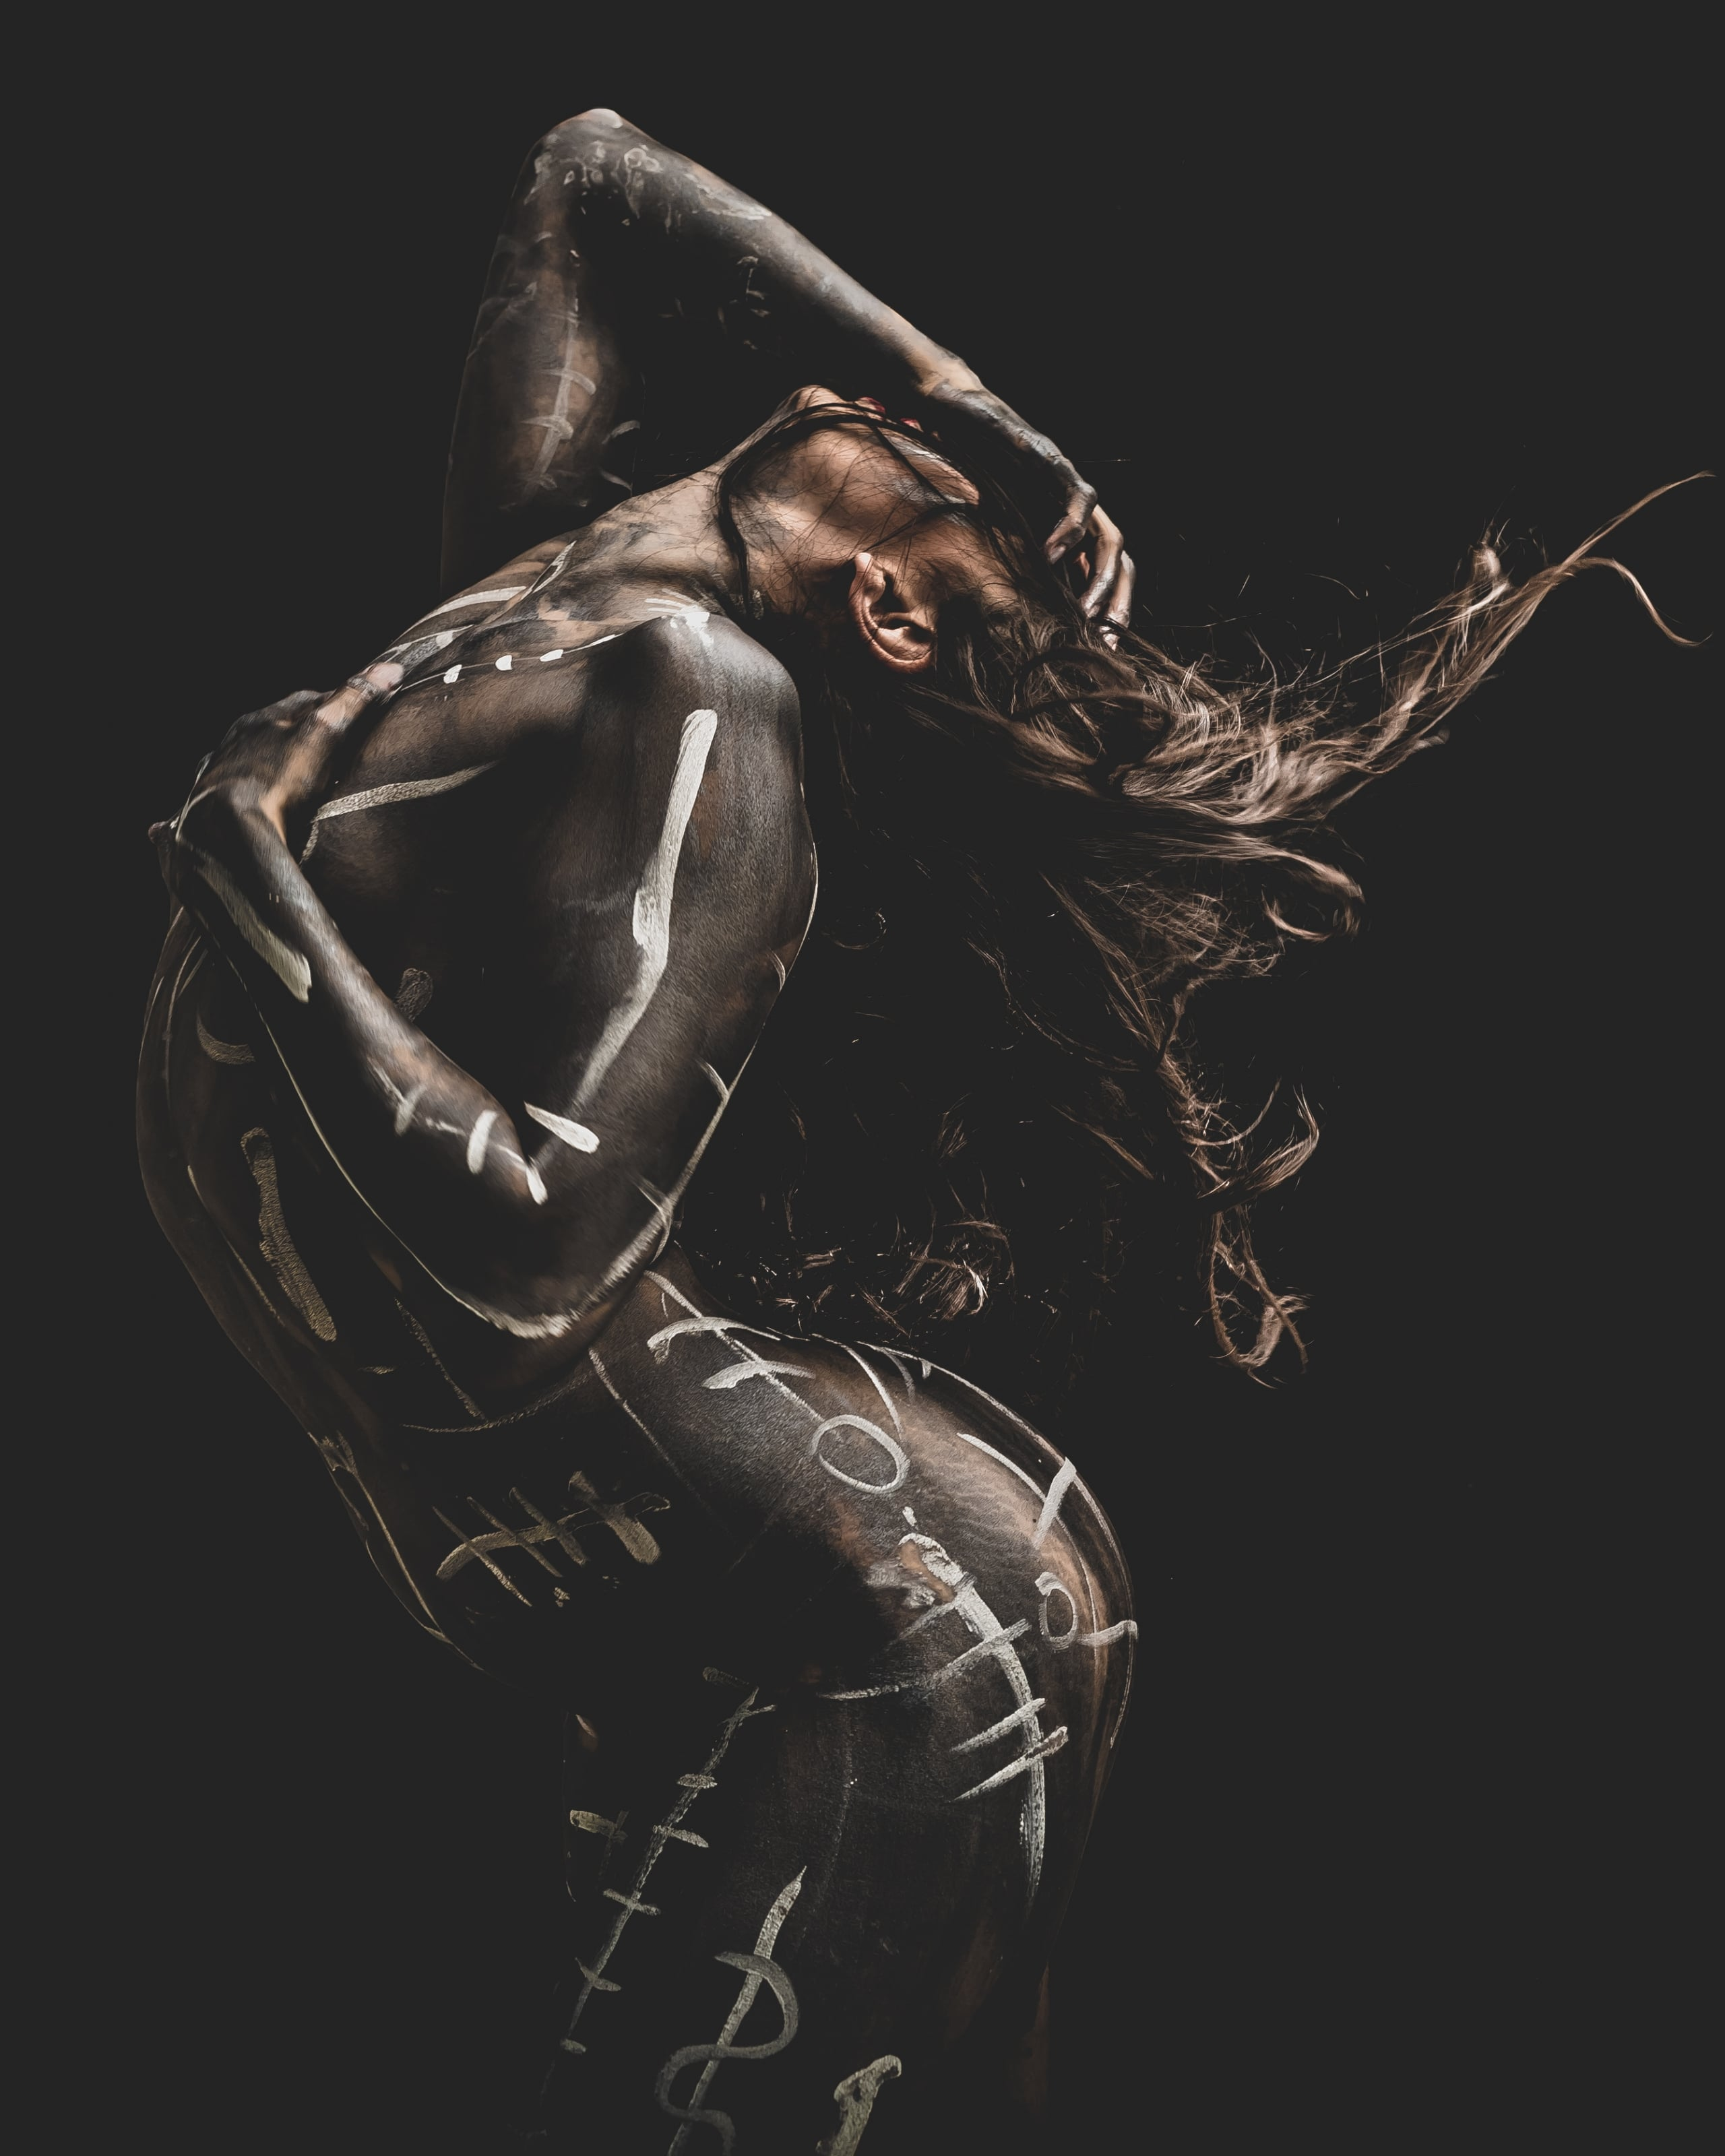 penetrate_darkness_by_gregory_beylerian-07244